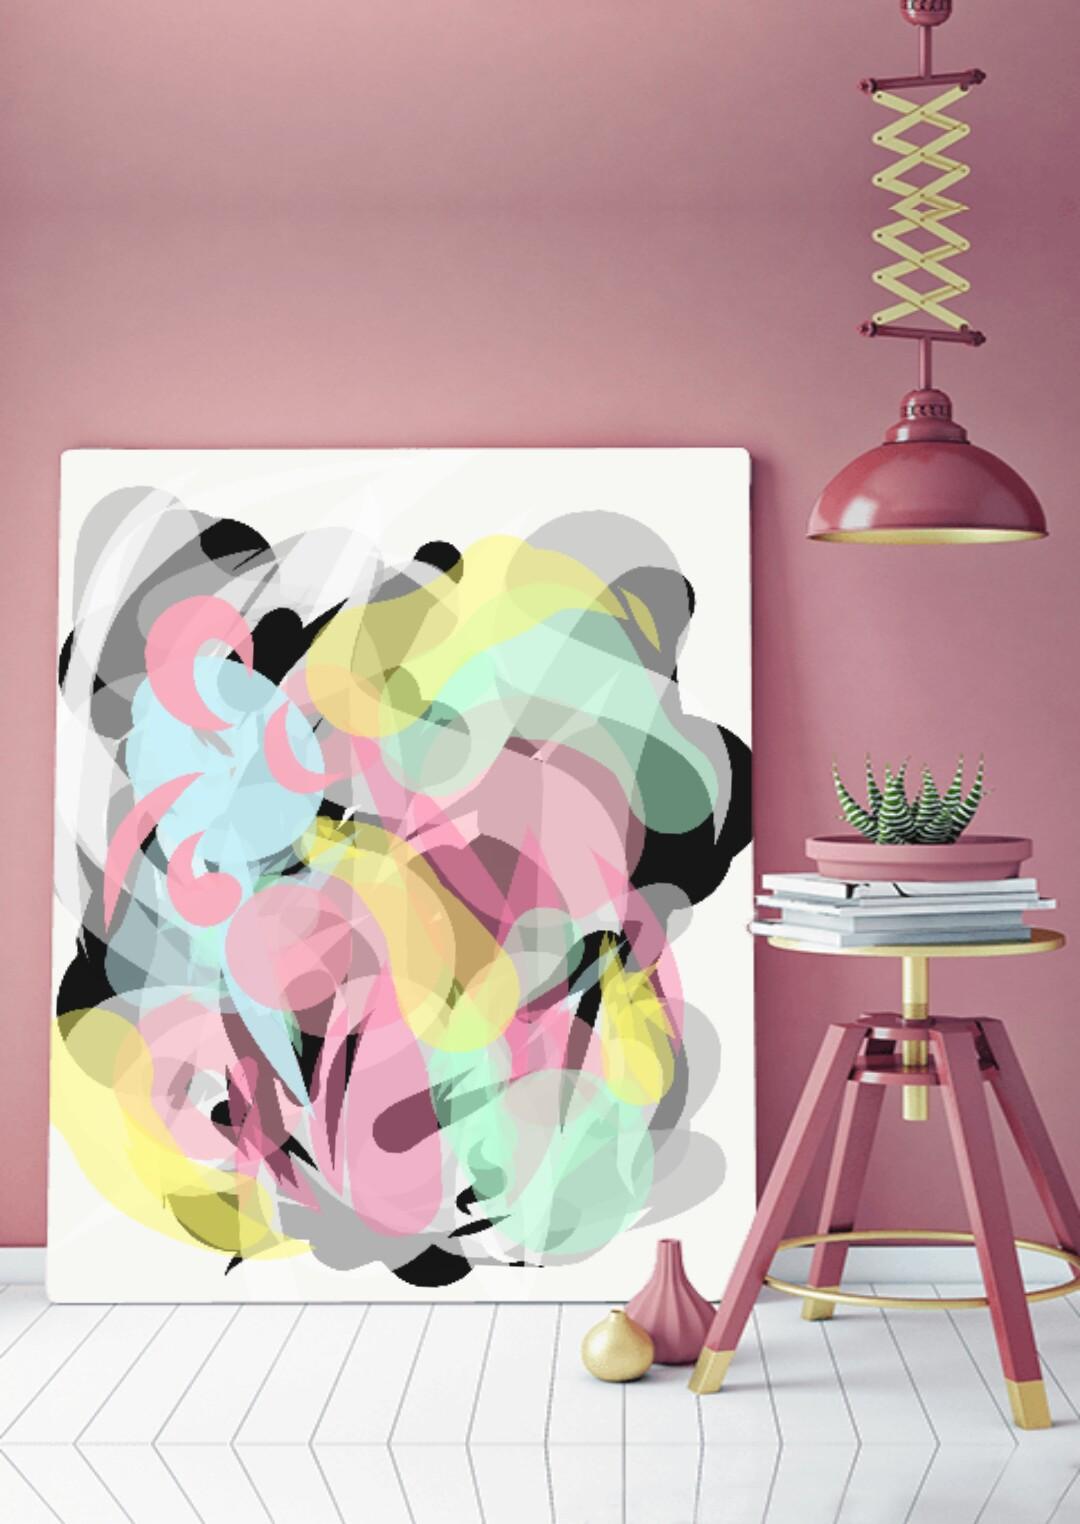 Fine art print | Artwork by Vinya Cameron | Illustration no. 5 | 2018